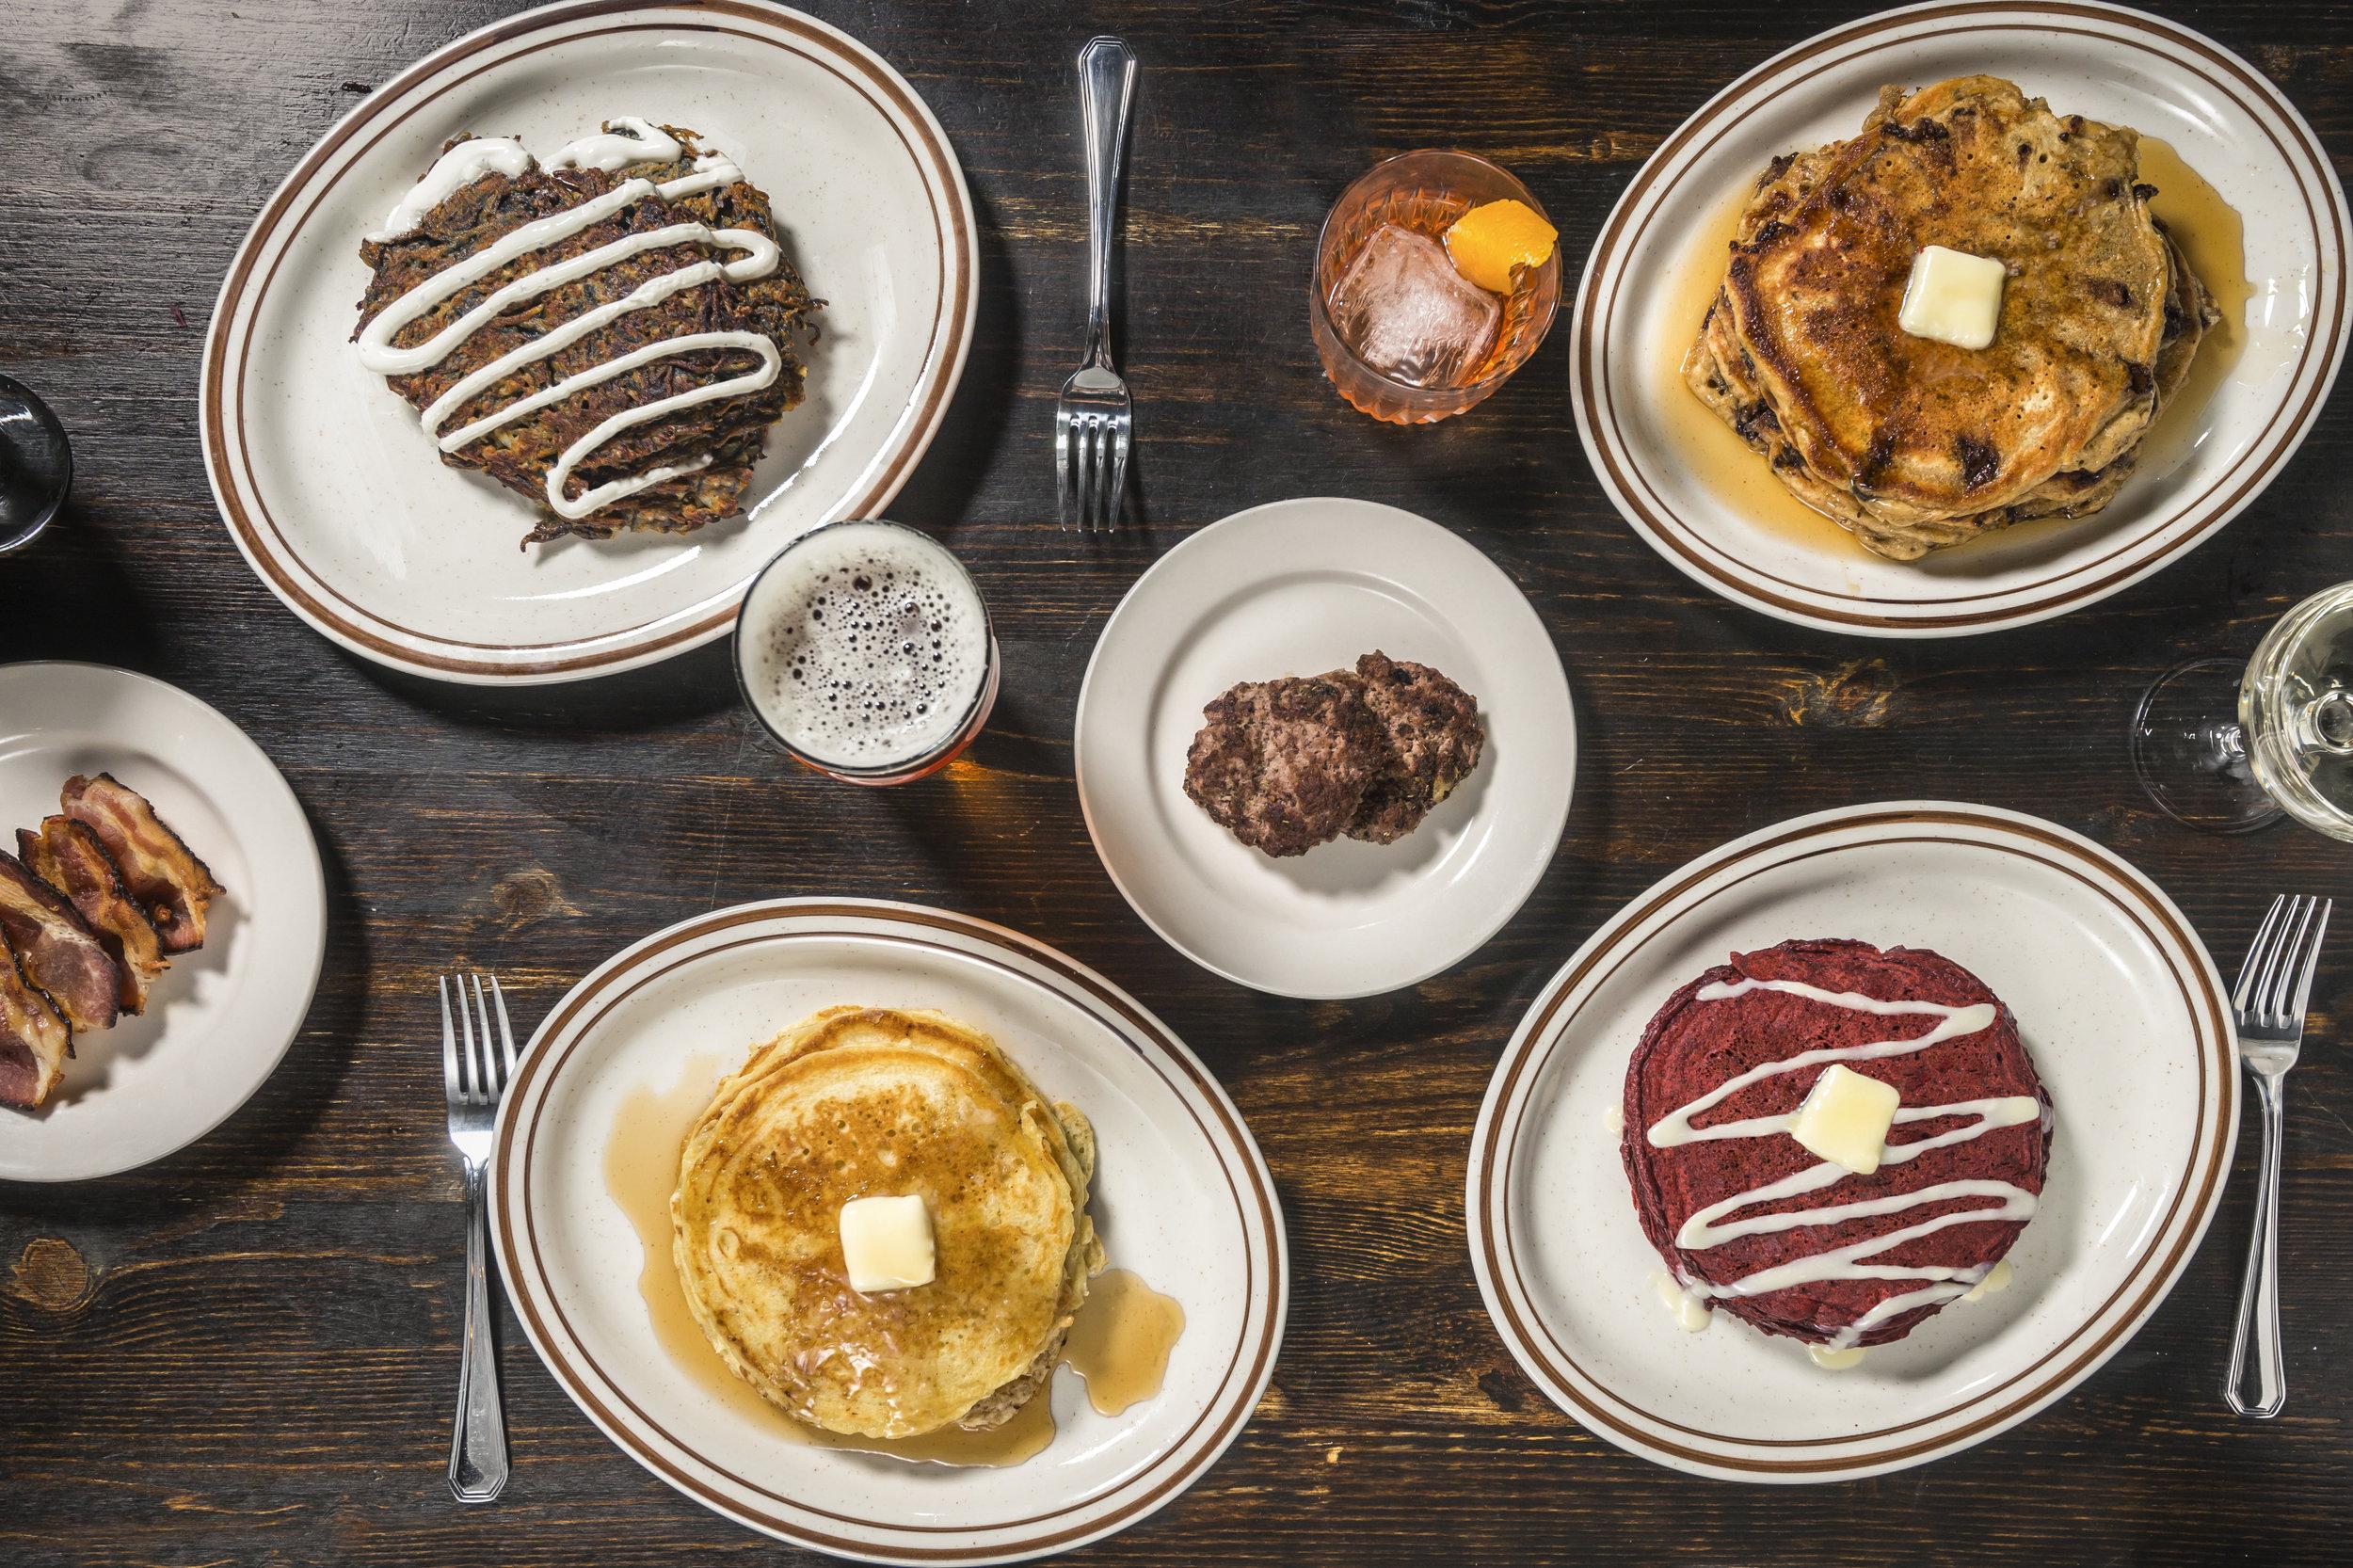 Midnight Pancakes, served starting Midnight. Photo credit Paul Wagtouicz.